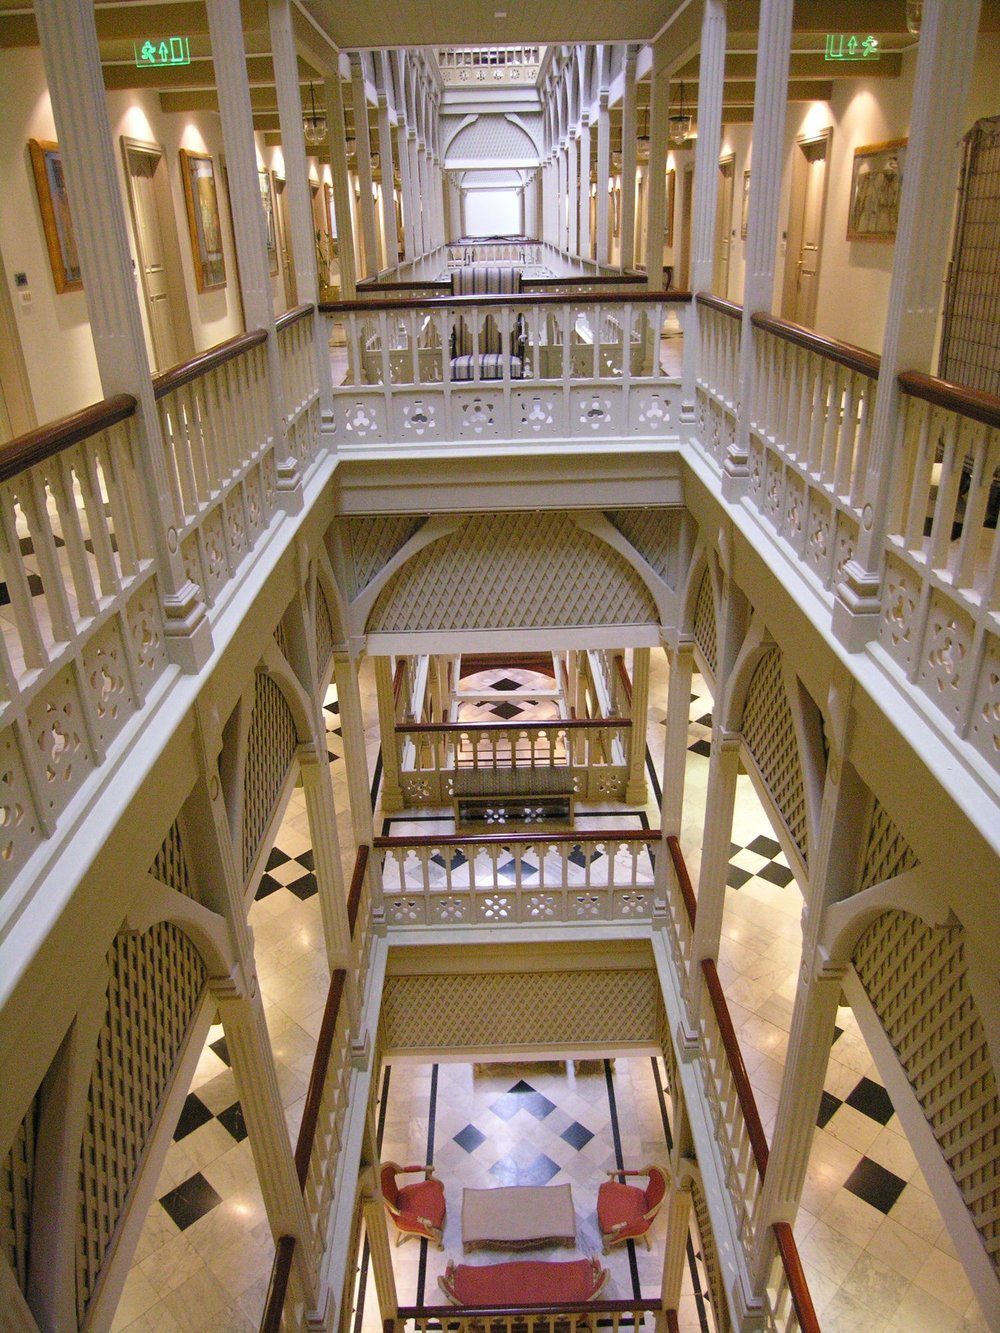 Taj Mahal Hotel Mumbai | Old part in wood and marble | Taj group | ©sandrine cohen